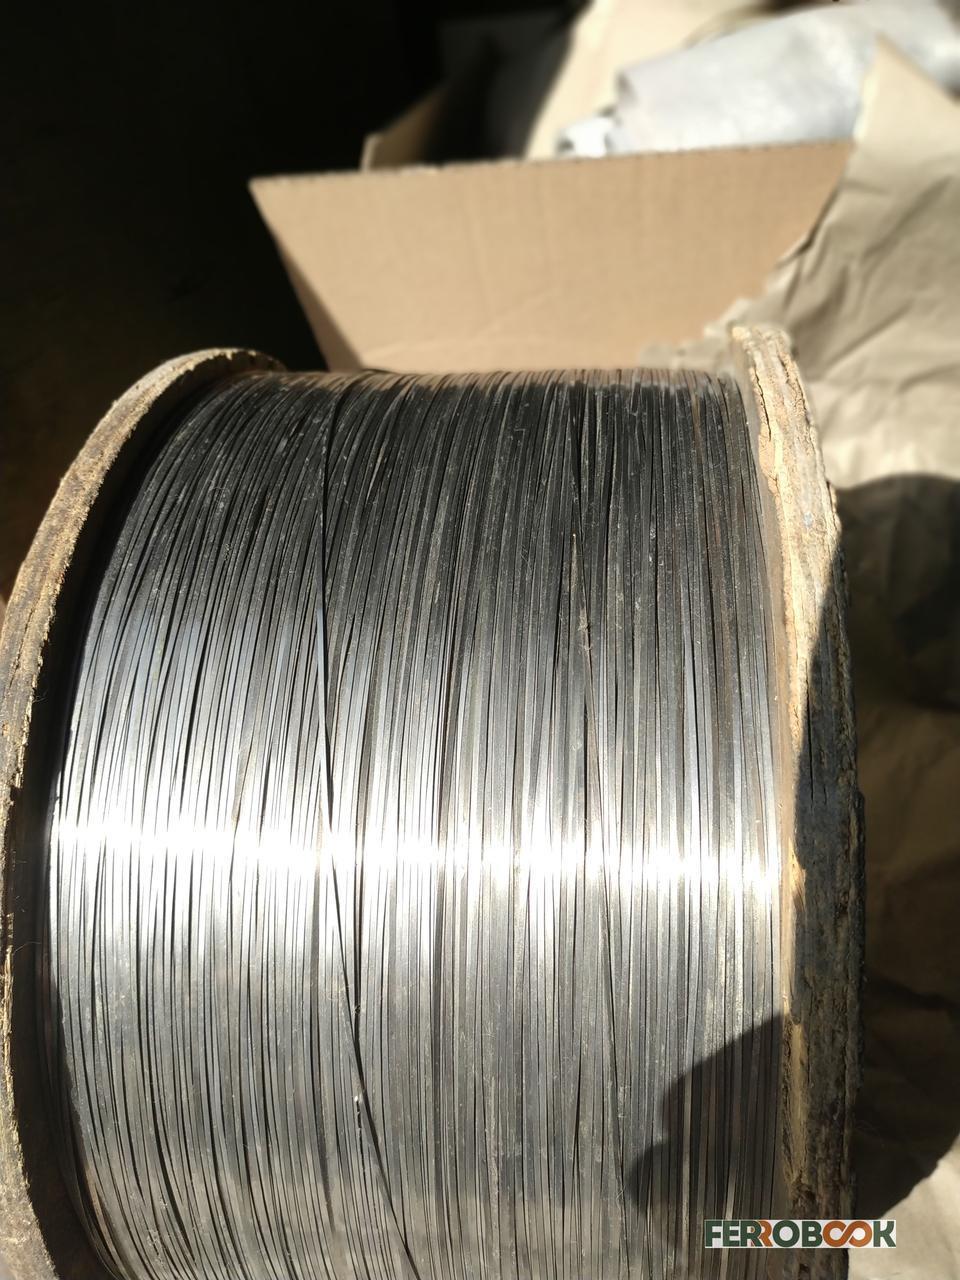 Нихромовая лента Х20Н80 0,2х1,2мм - 200м